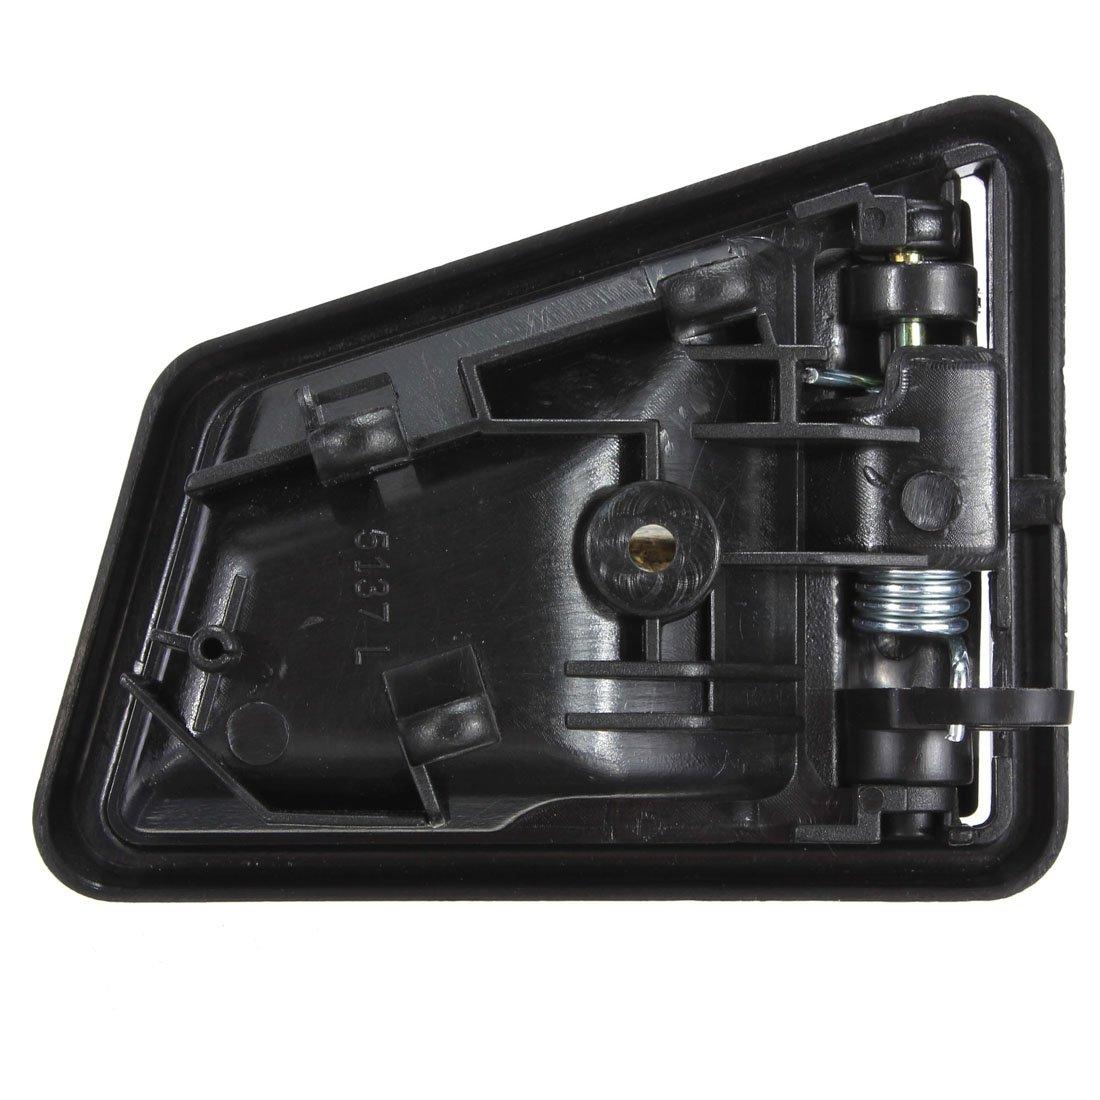 4pcs Inner Inside Interior Door Handles for Suzuki Sidekick Geo Tracker 1991 1992 1993 1994 1995 1996 1997 1998 CALAP-STORE